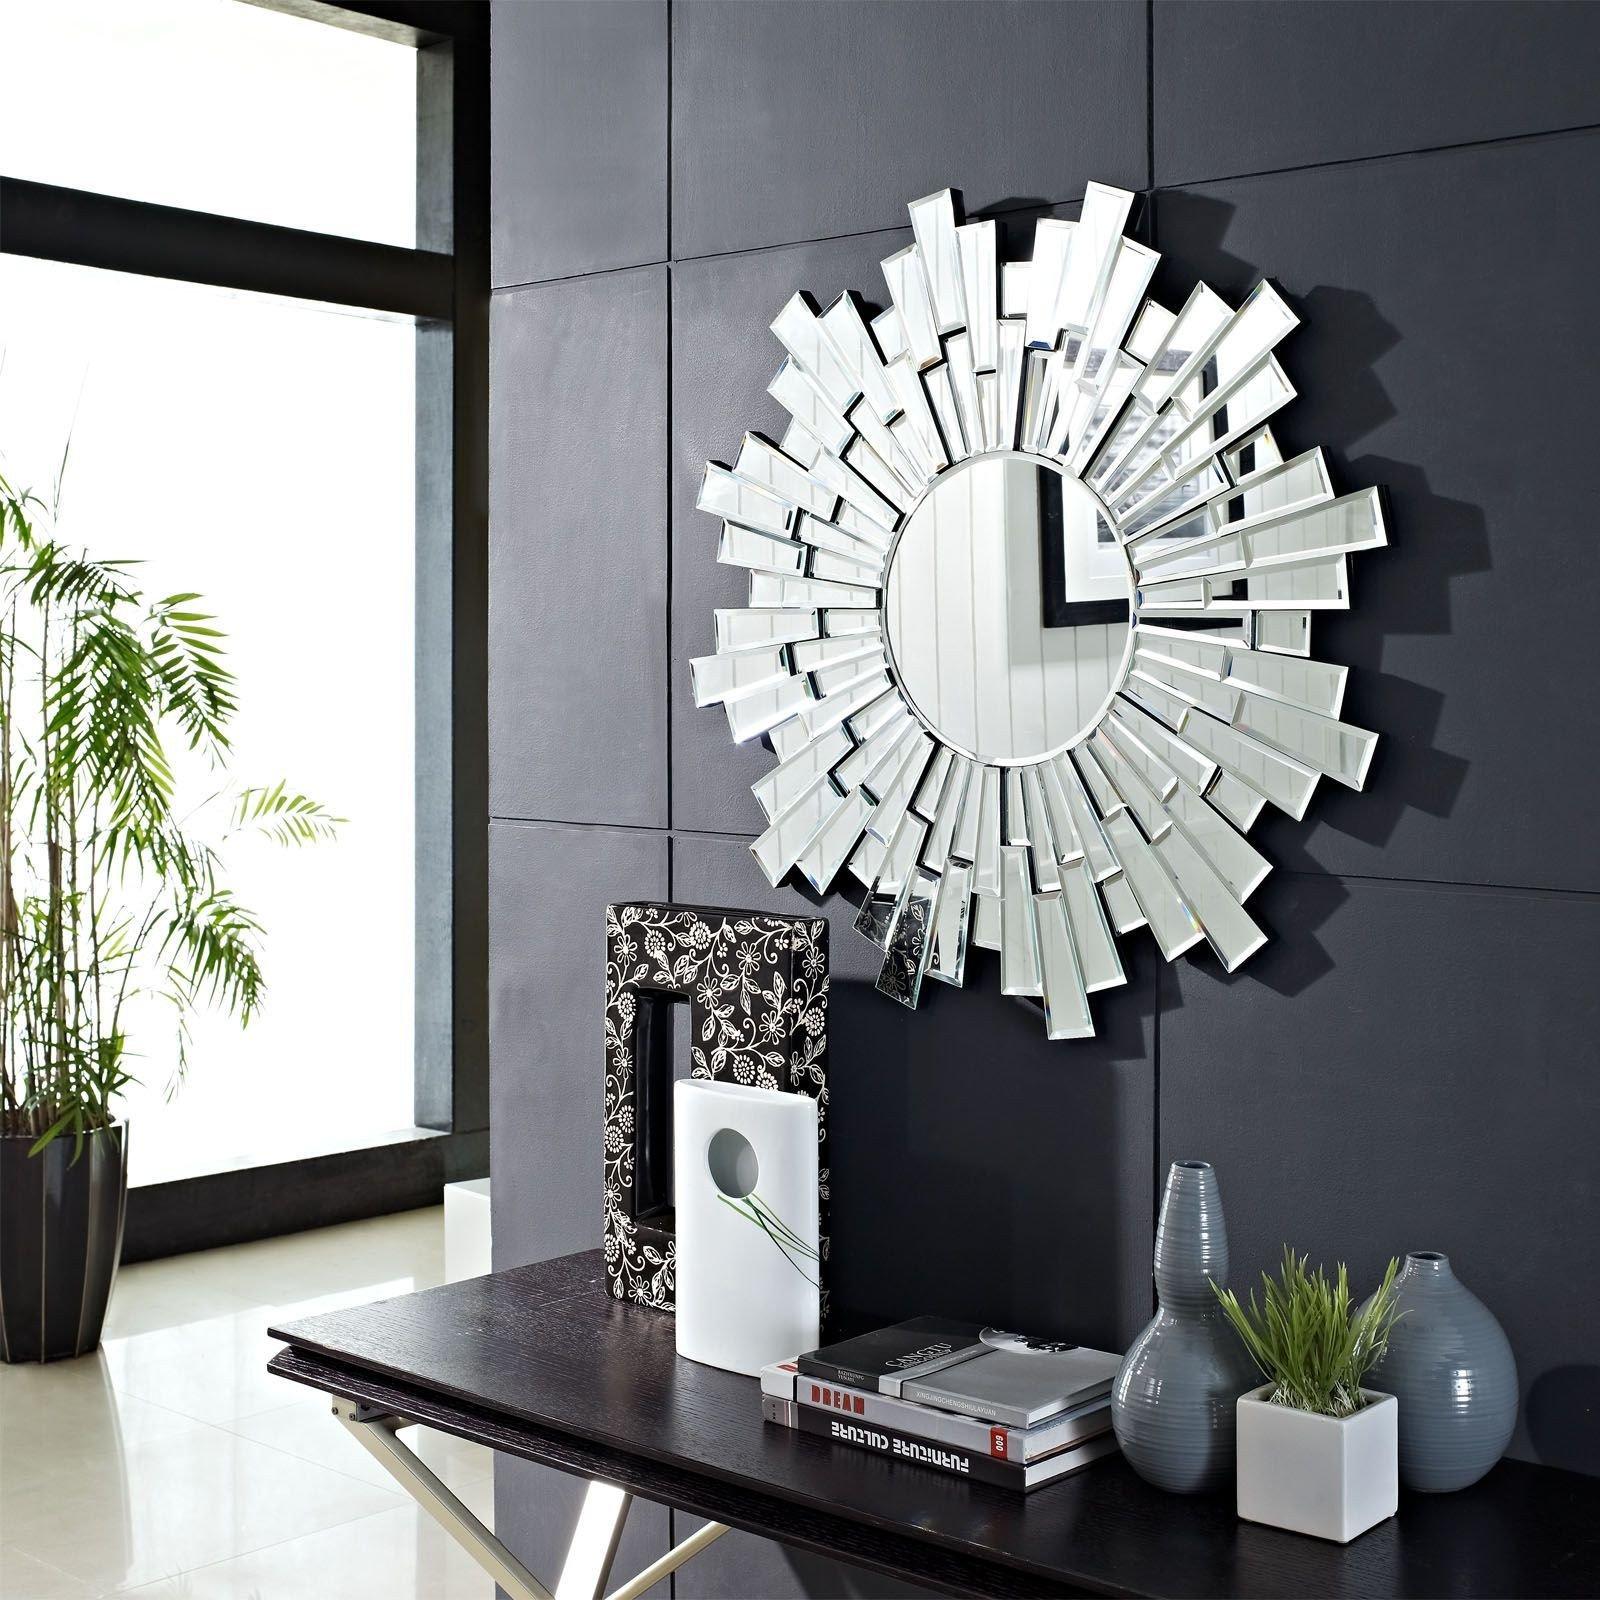 Mirrors for Bedroom Walls Beautiful 14 Thrilling Bedroom Wall Mirror Ikea Hacks Ideas